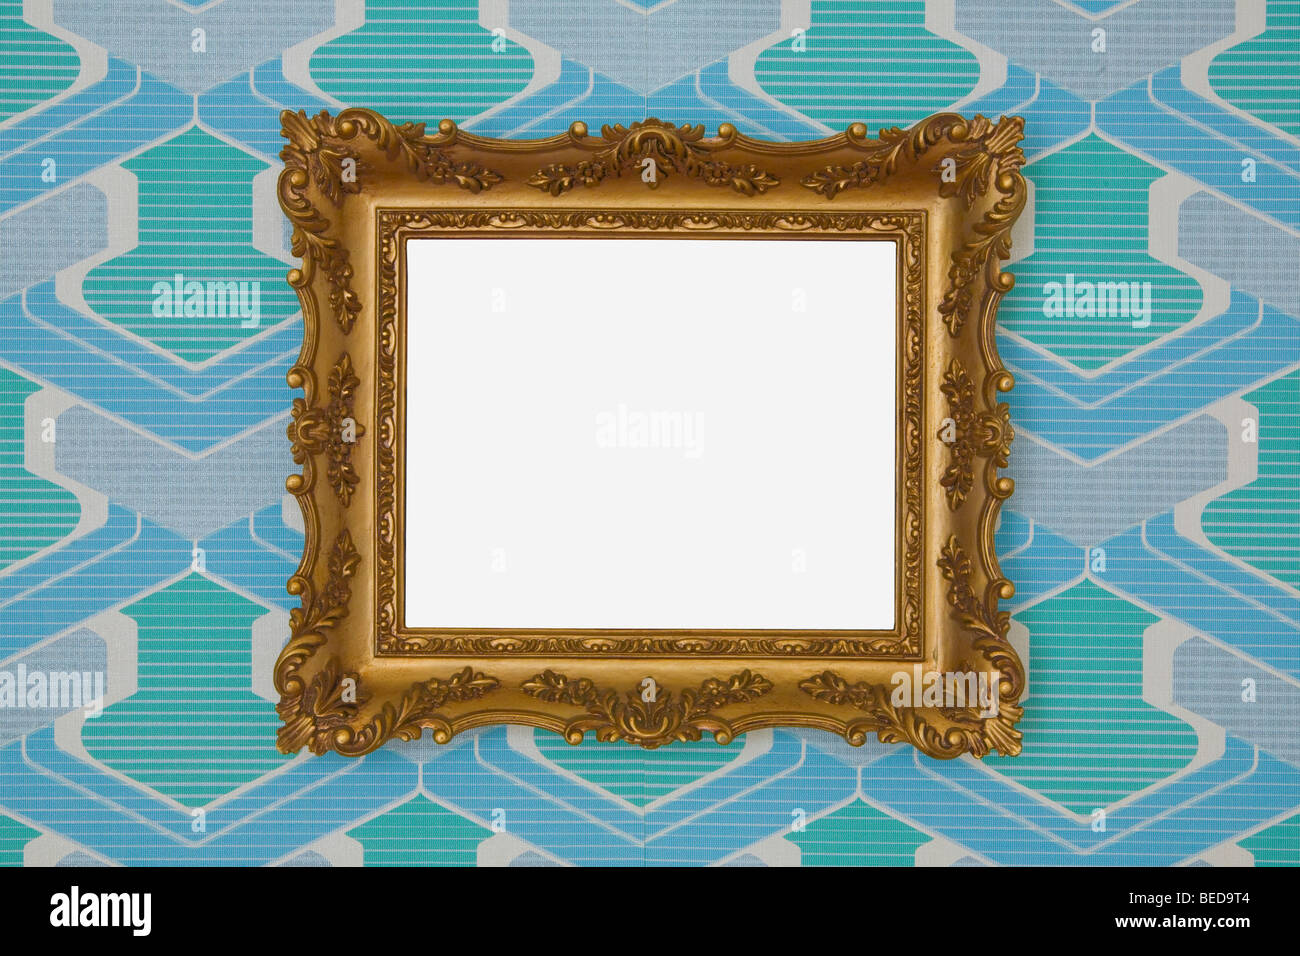 Rahmen Stockfotos & Rahmen Bilder - Alamy